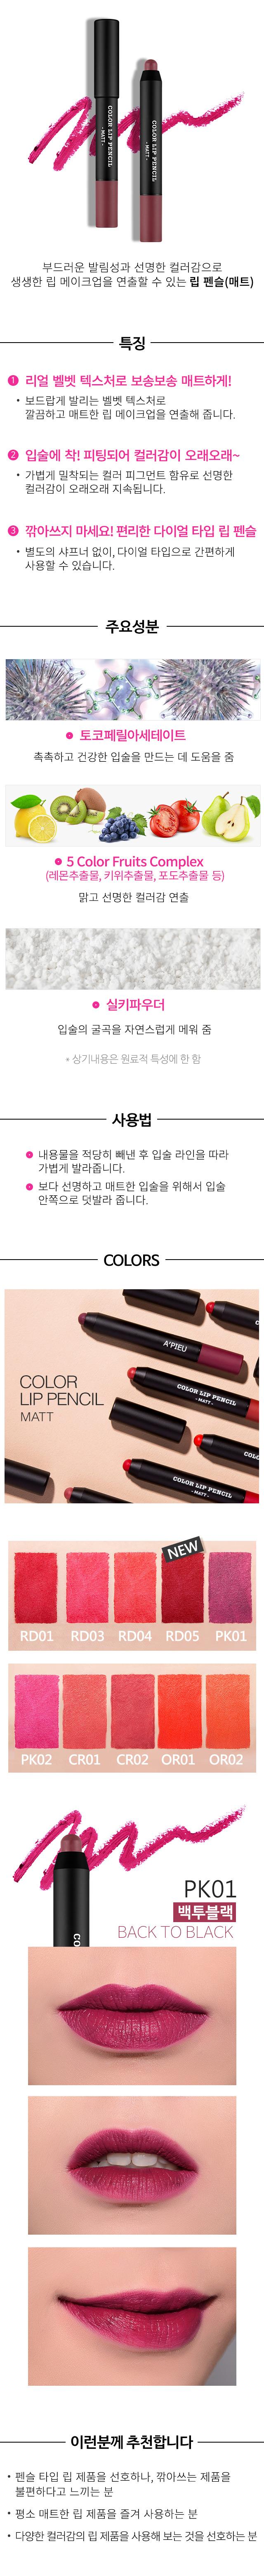 APIEU_Color_Lip_Pencil_Matt_PK01_04_1.jpg